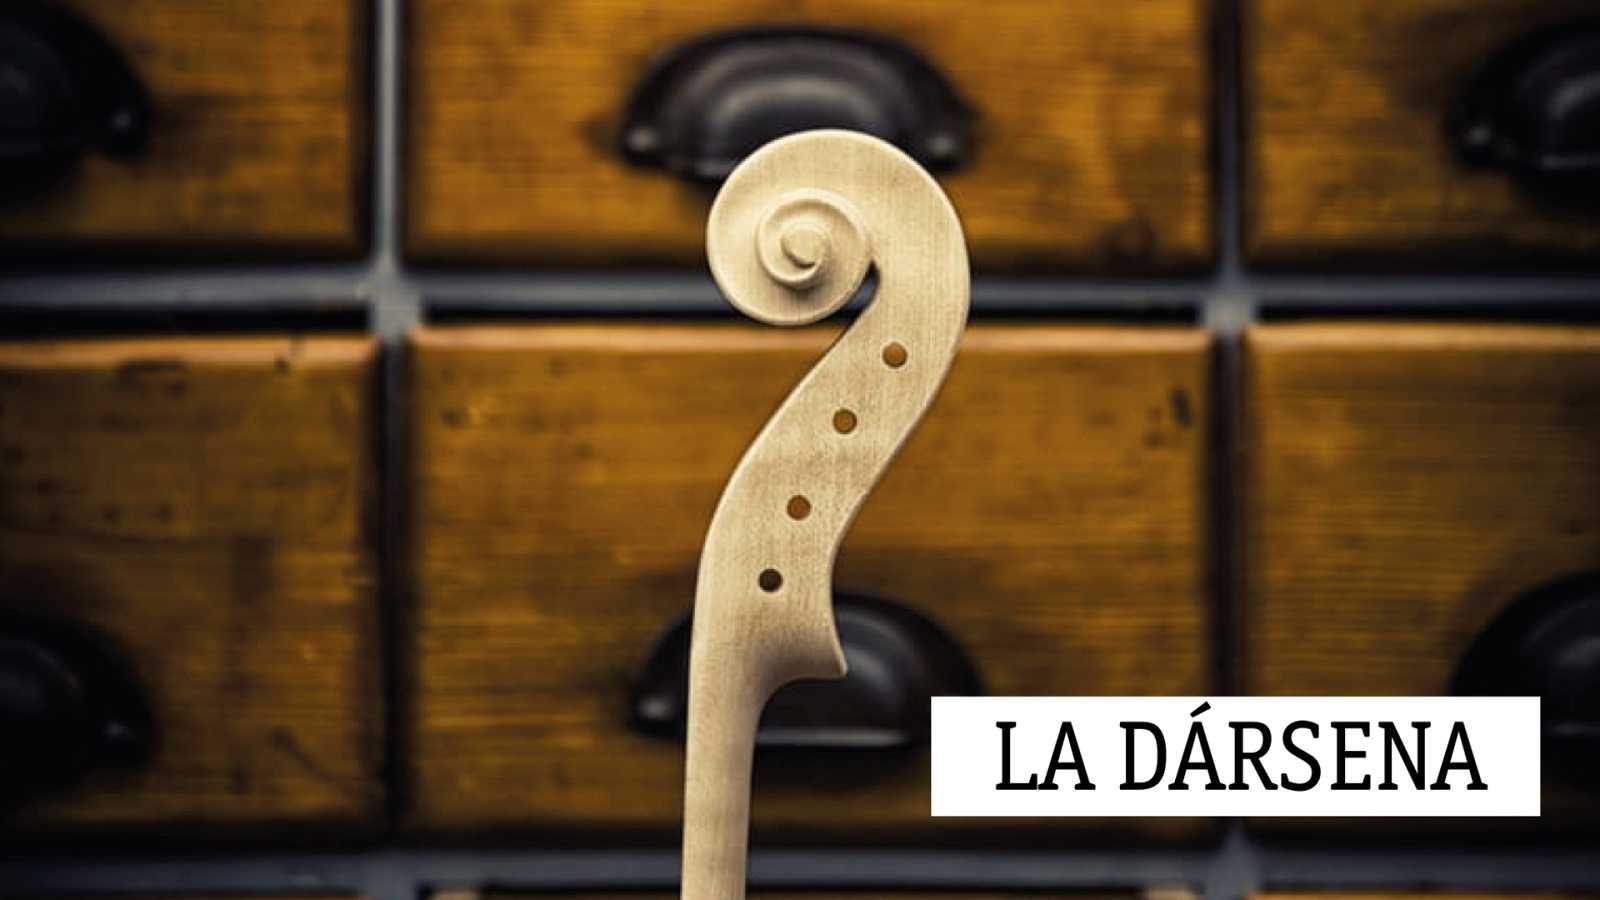 La dársena - Javier Negrín - 20/10/20 - escuchar ahora